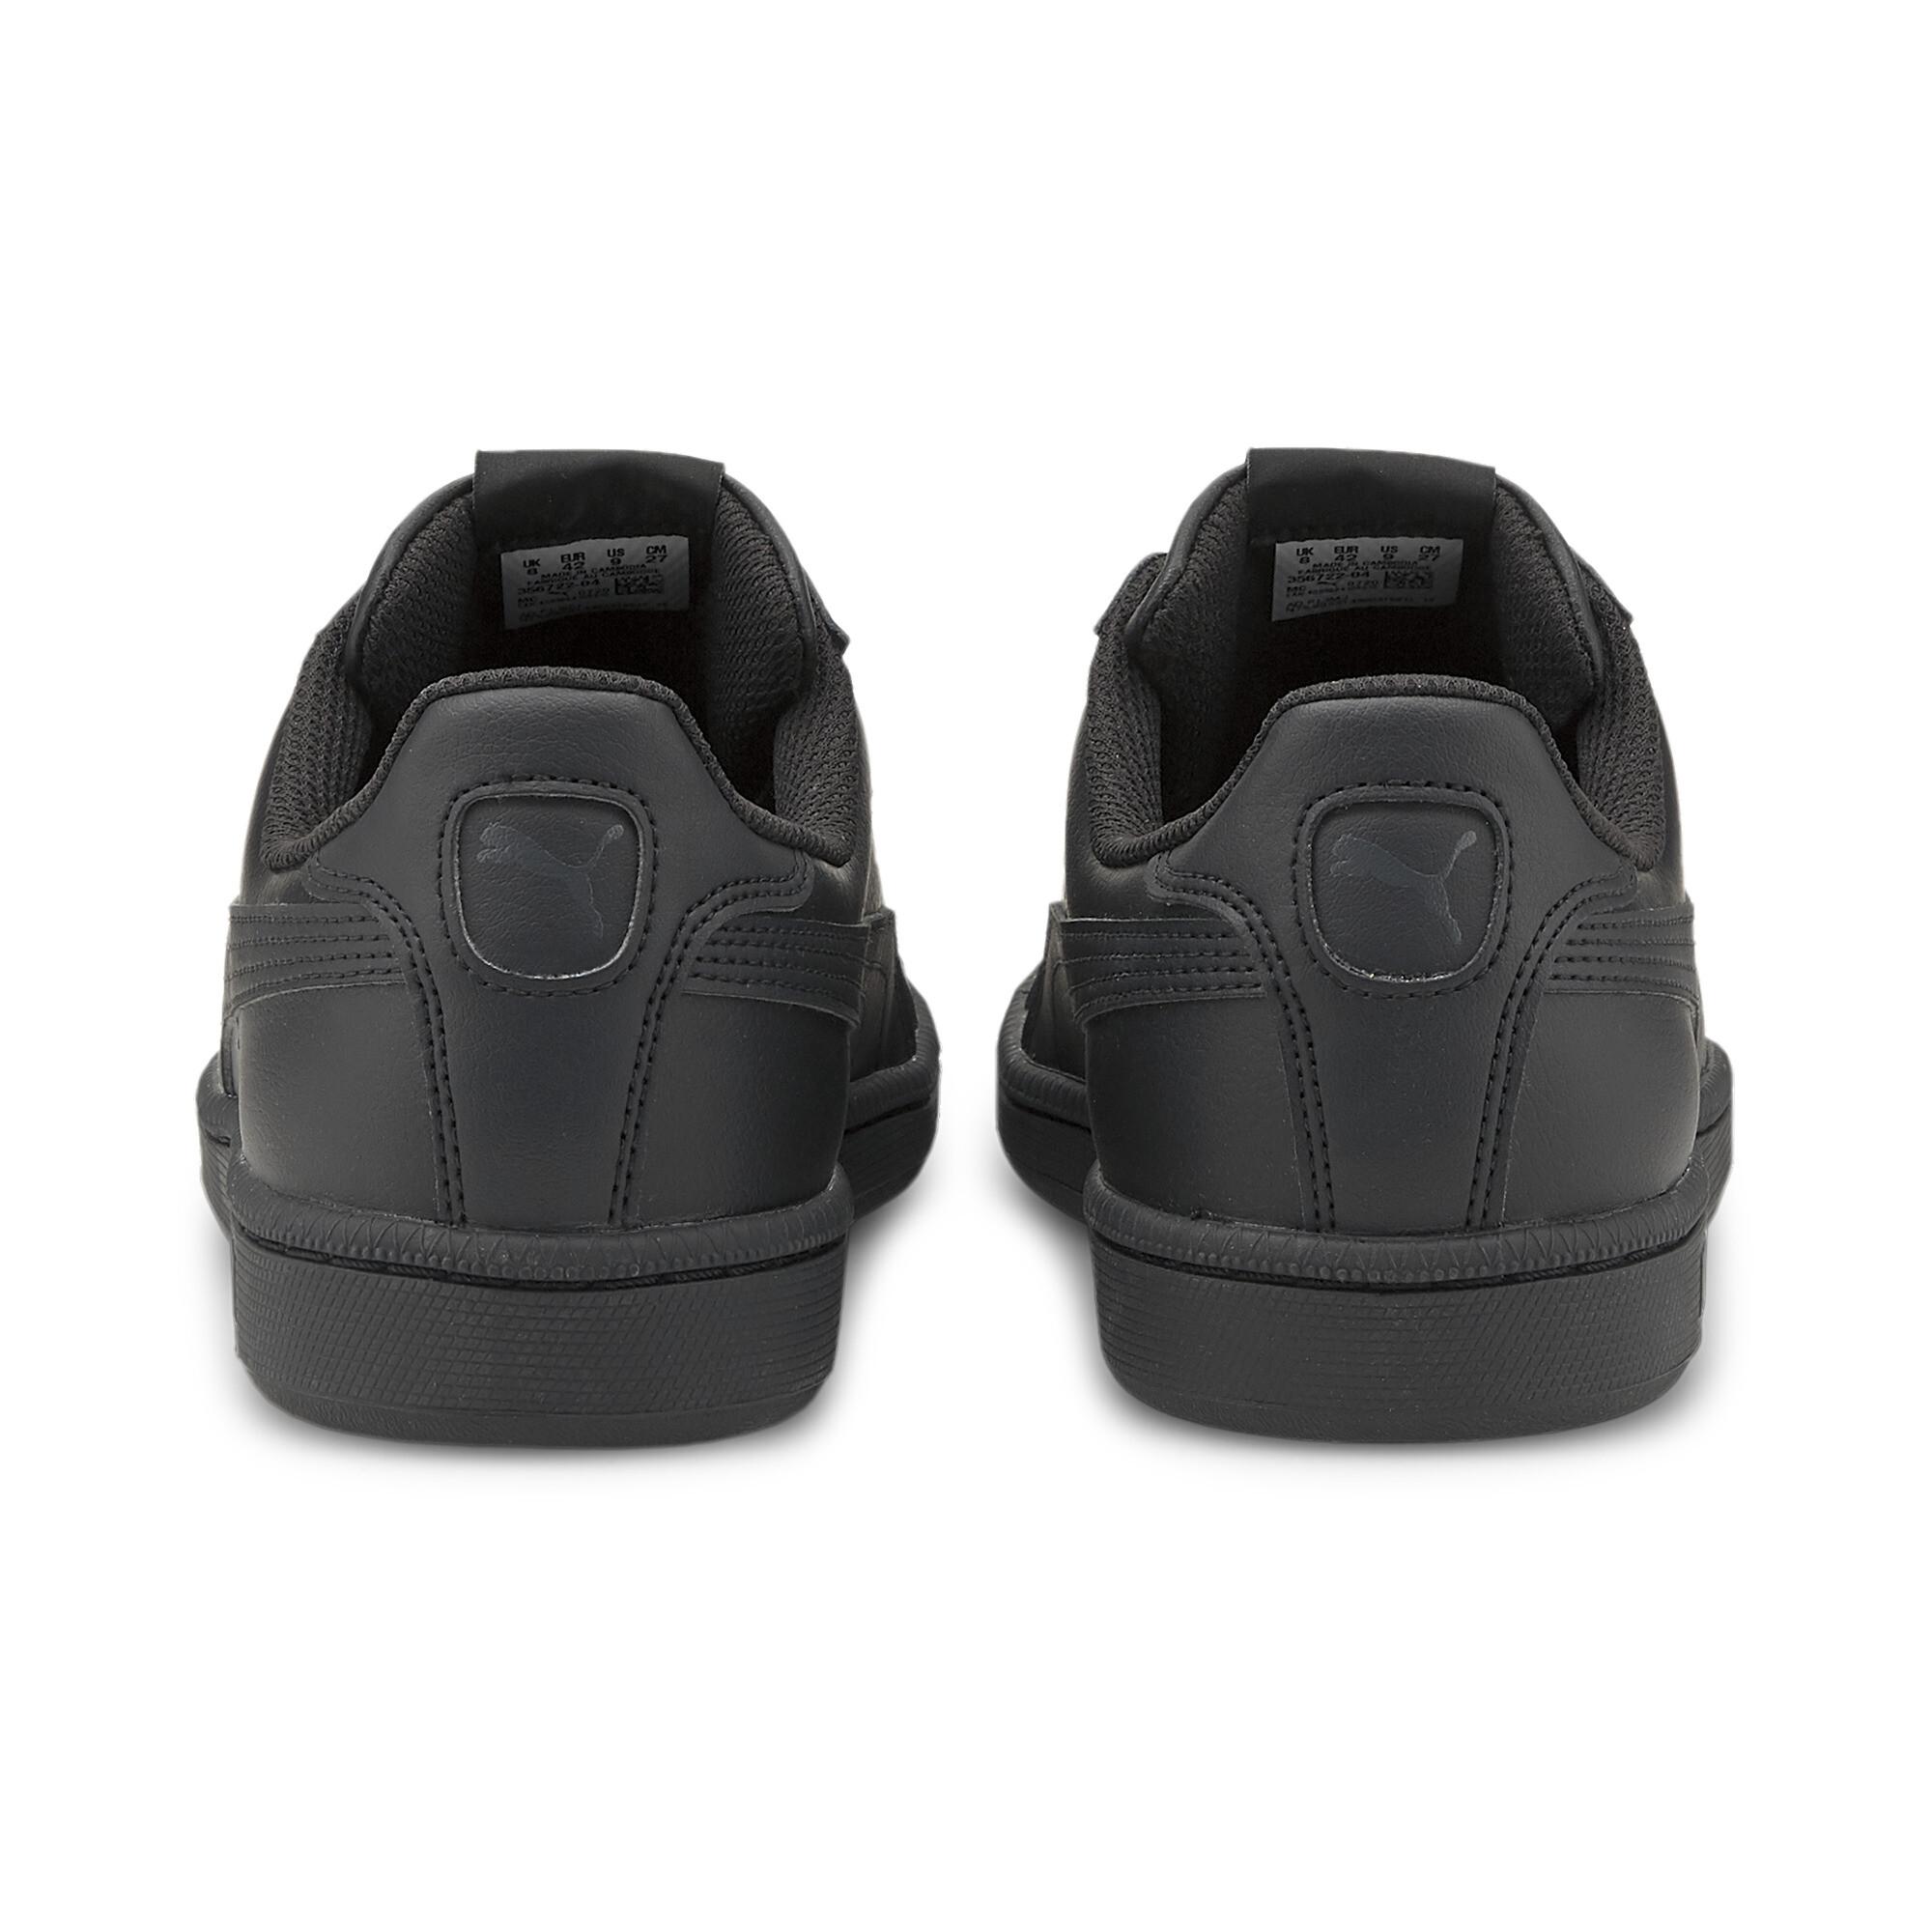 PUMA-Smash-Trainers-Schuhe-Sneakers-Sport-Classics-Unisex-Neu Indexbild 3